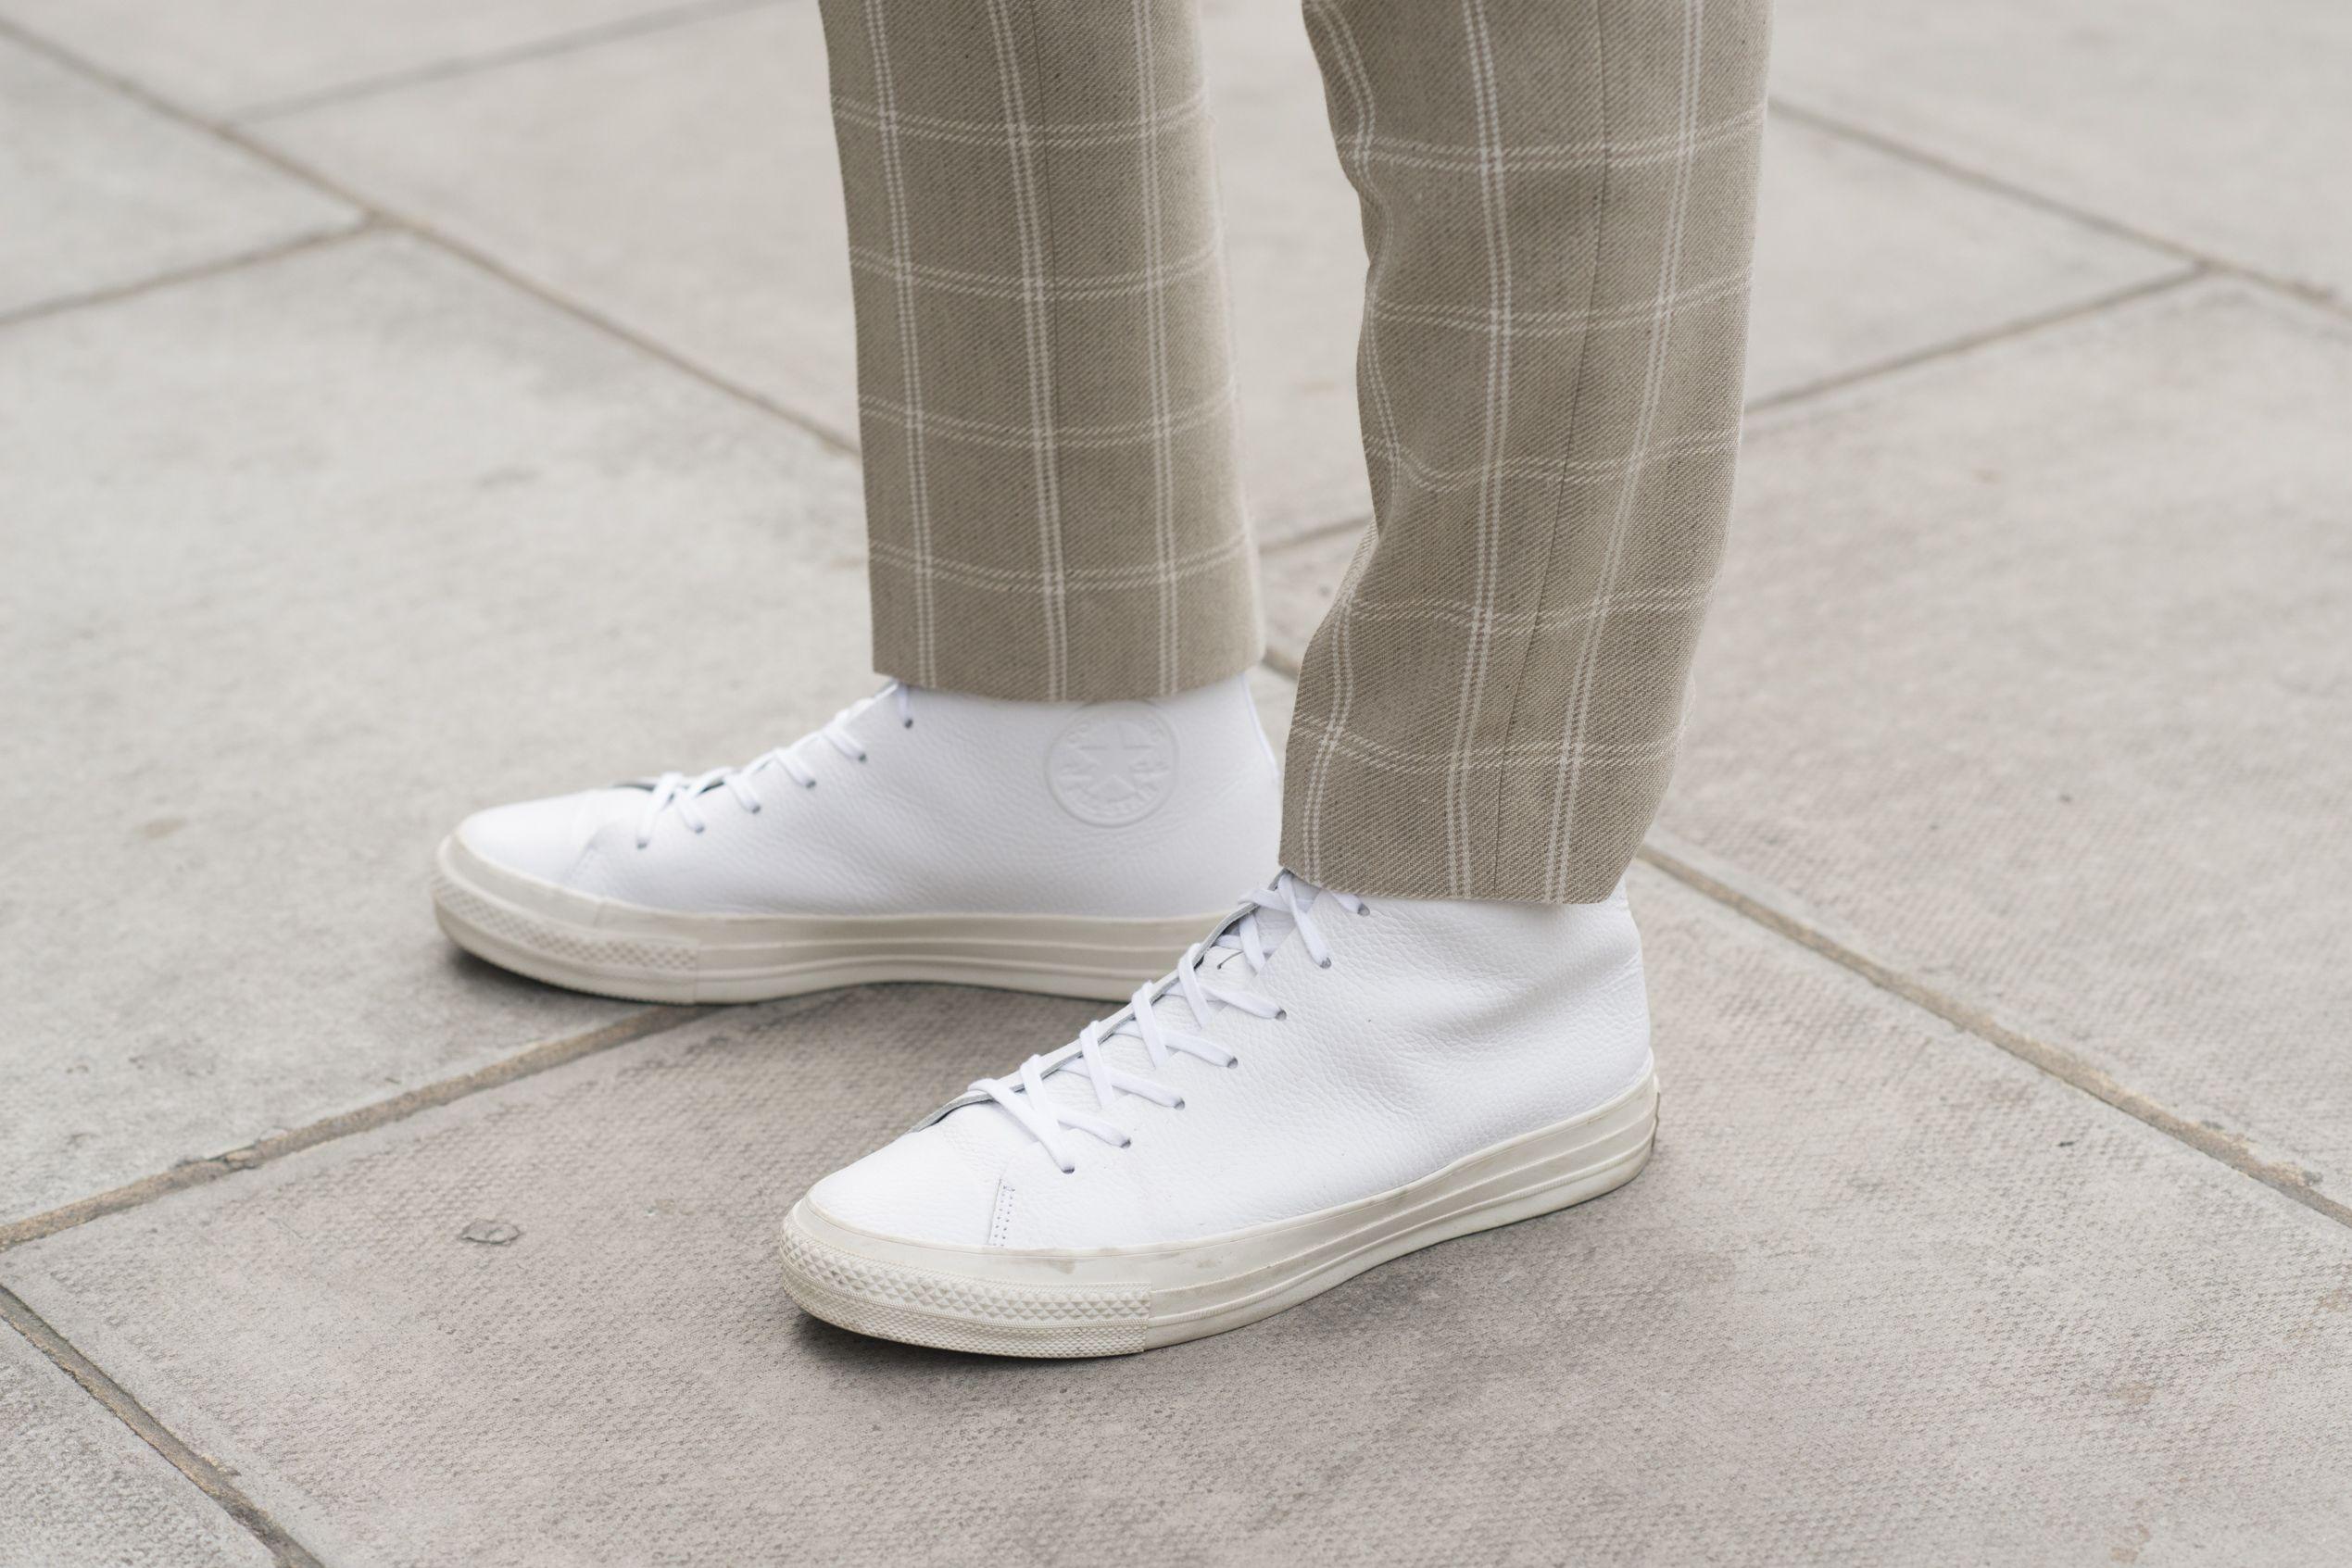 witte adidas schoenen in de wasmachine